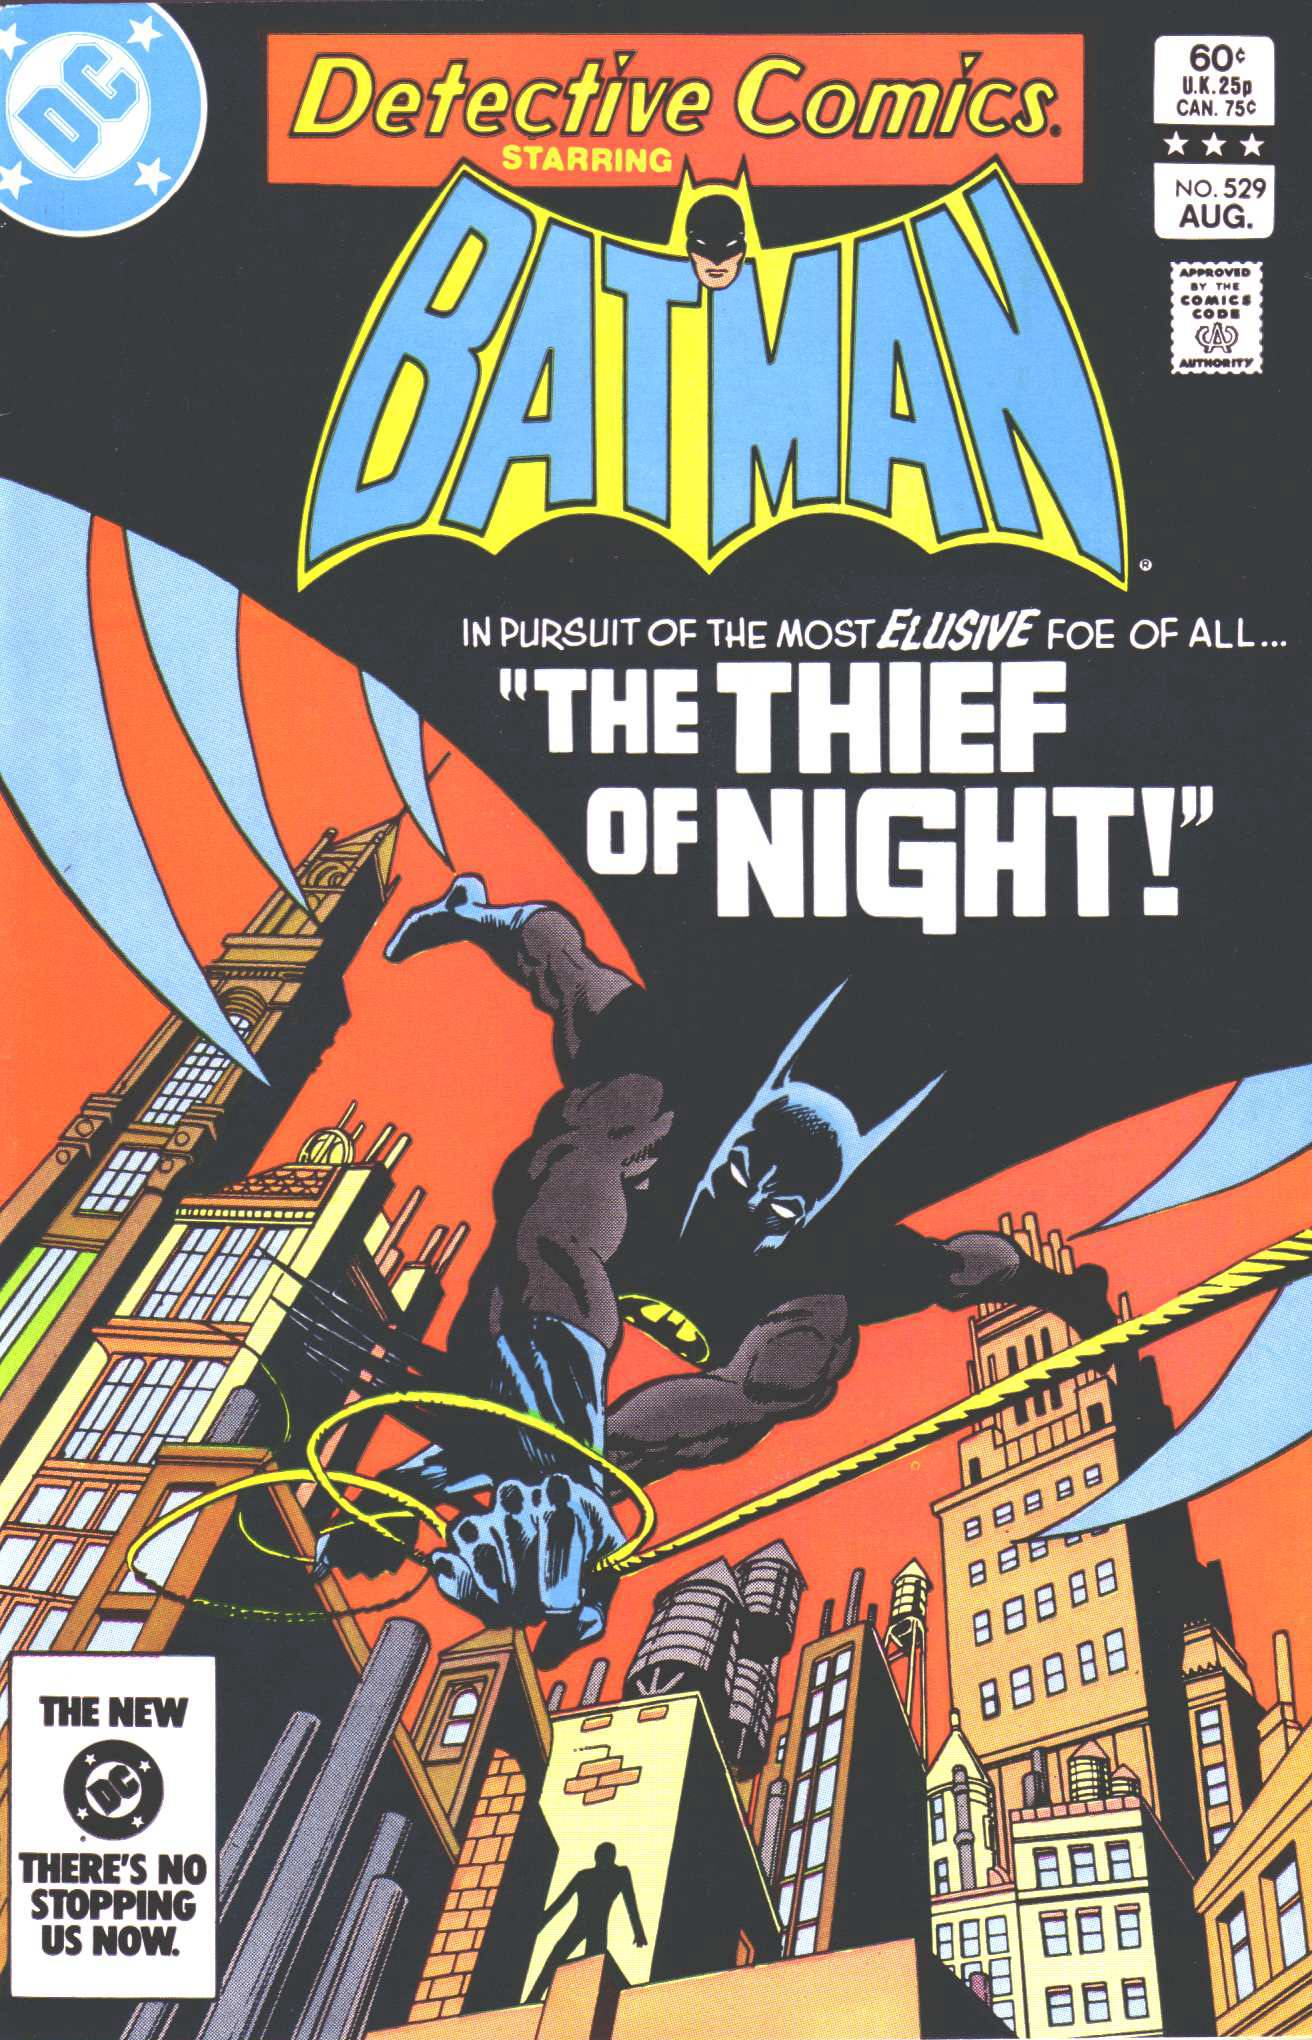 Detective Comics (1937) 529 Page 1